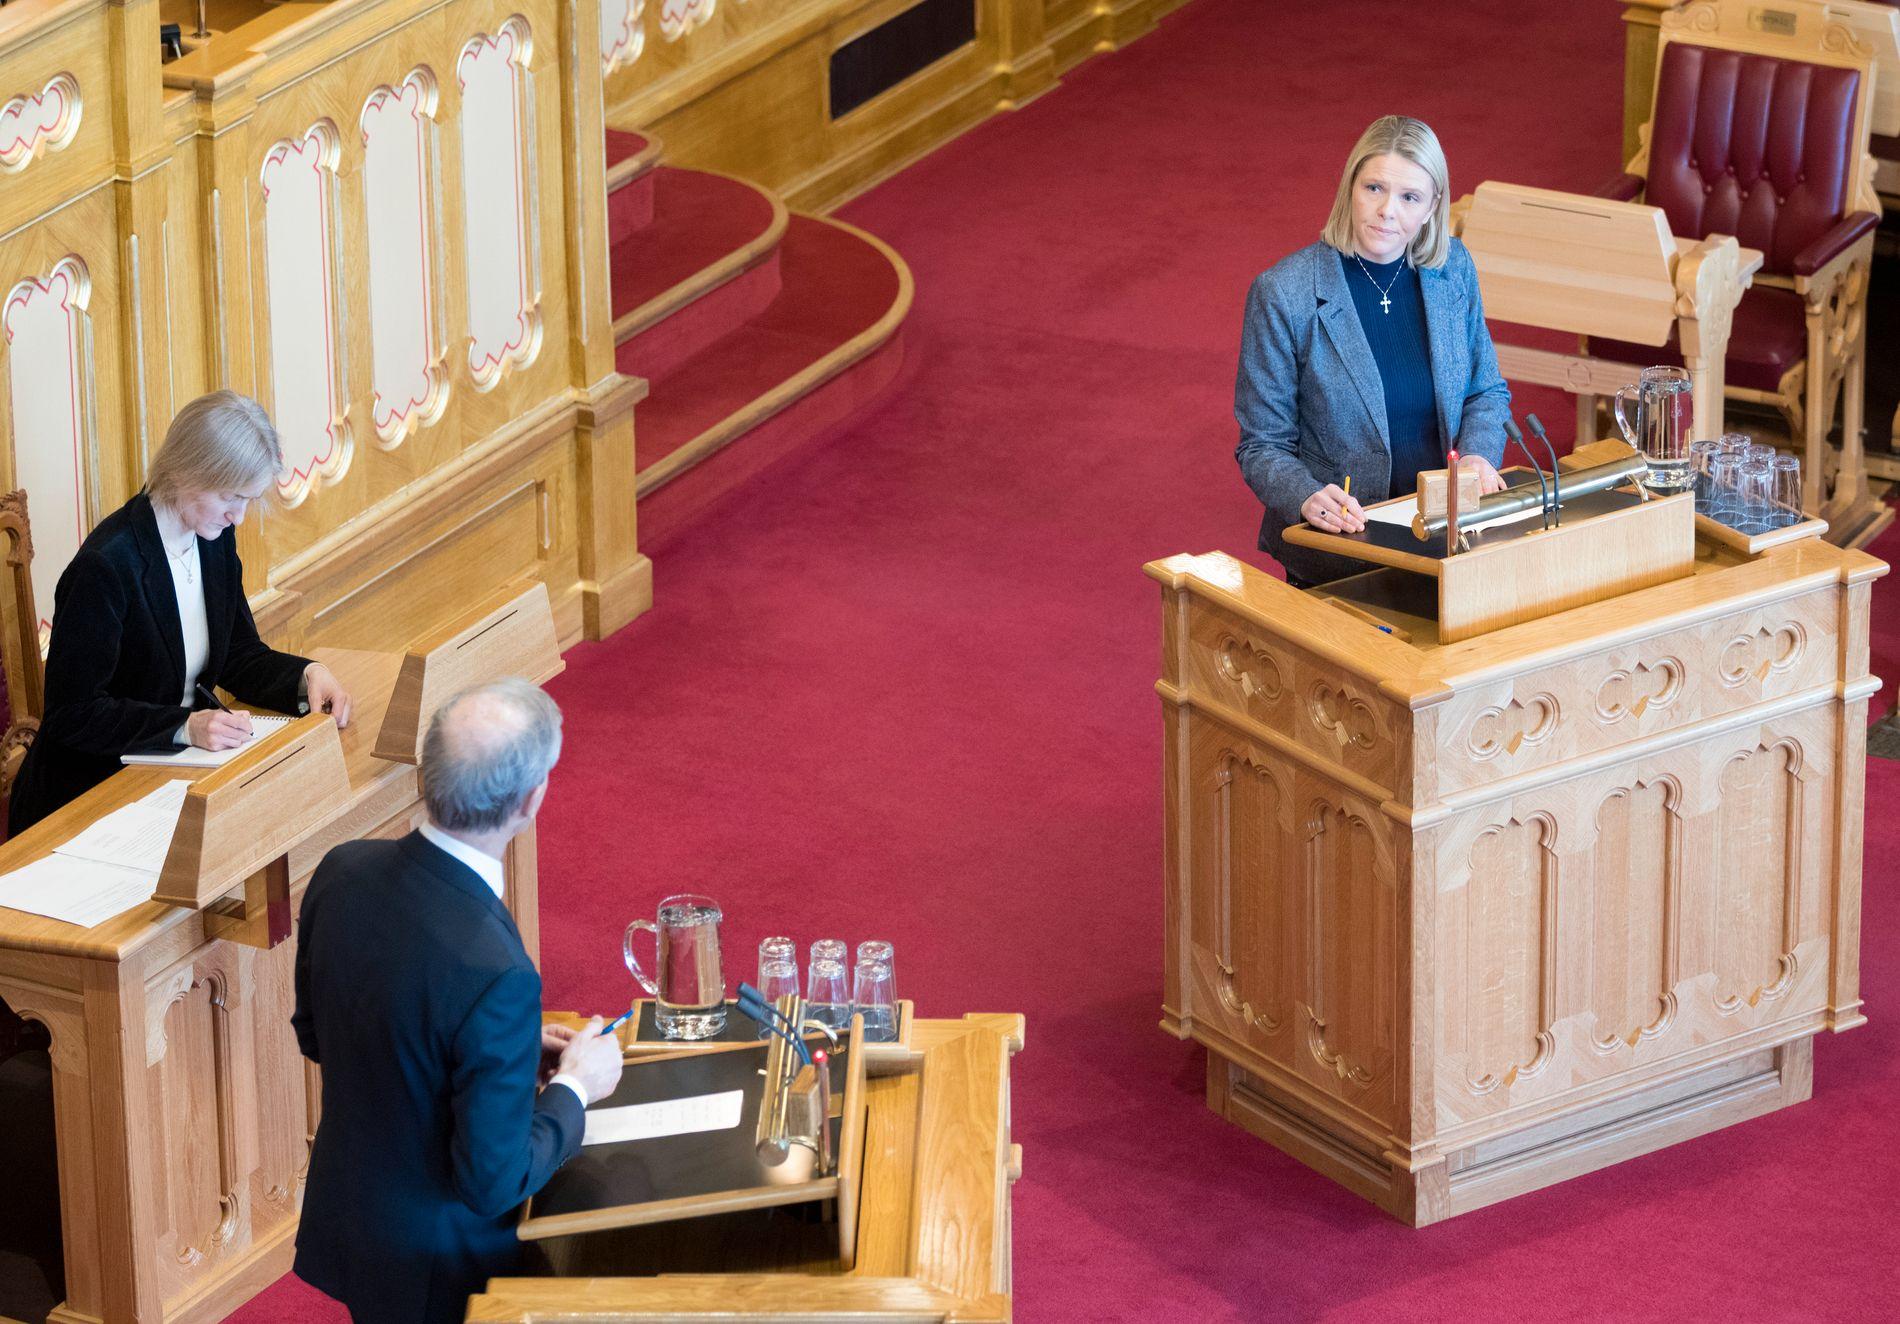 Justisminister Sylvi Listhaug (Frp) og Arbeiderpartiets leder Jonas Gahr Støre på talerstolene i Stortinget, torsdag. Foto: Gorm Kallestad / NTB scanpix